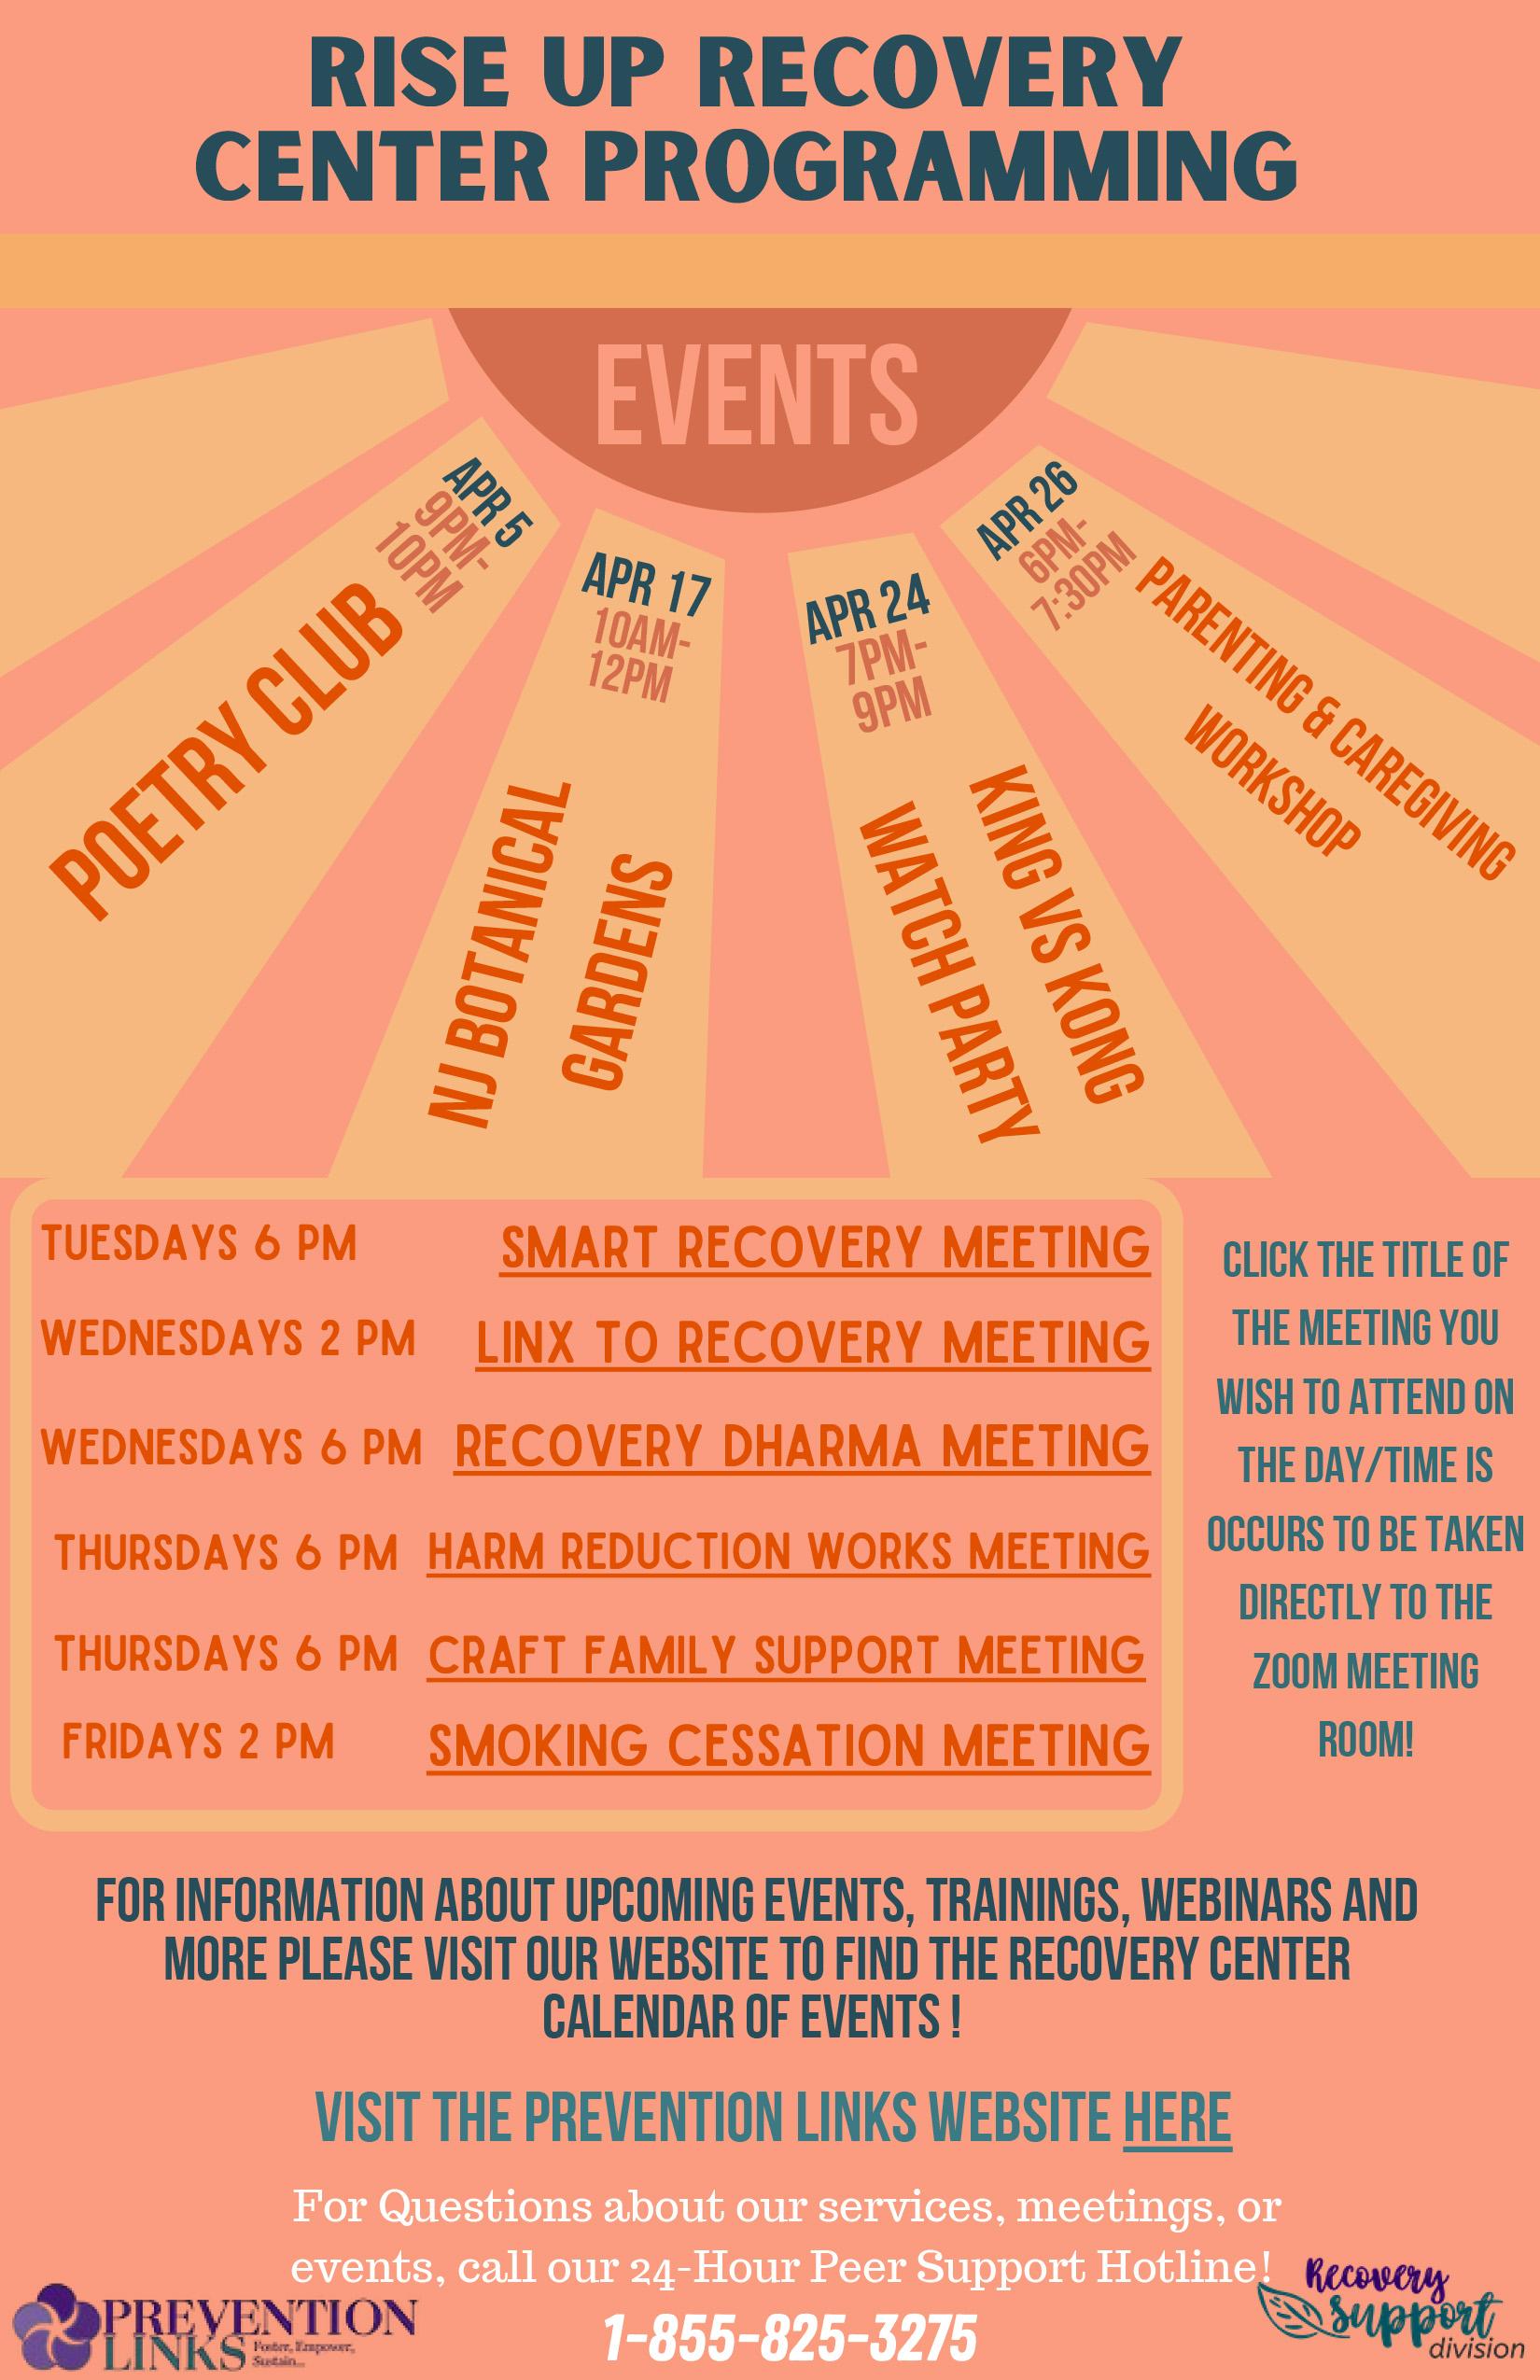 Rise Up Recovery Center Calendar April 2021